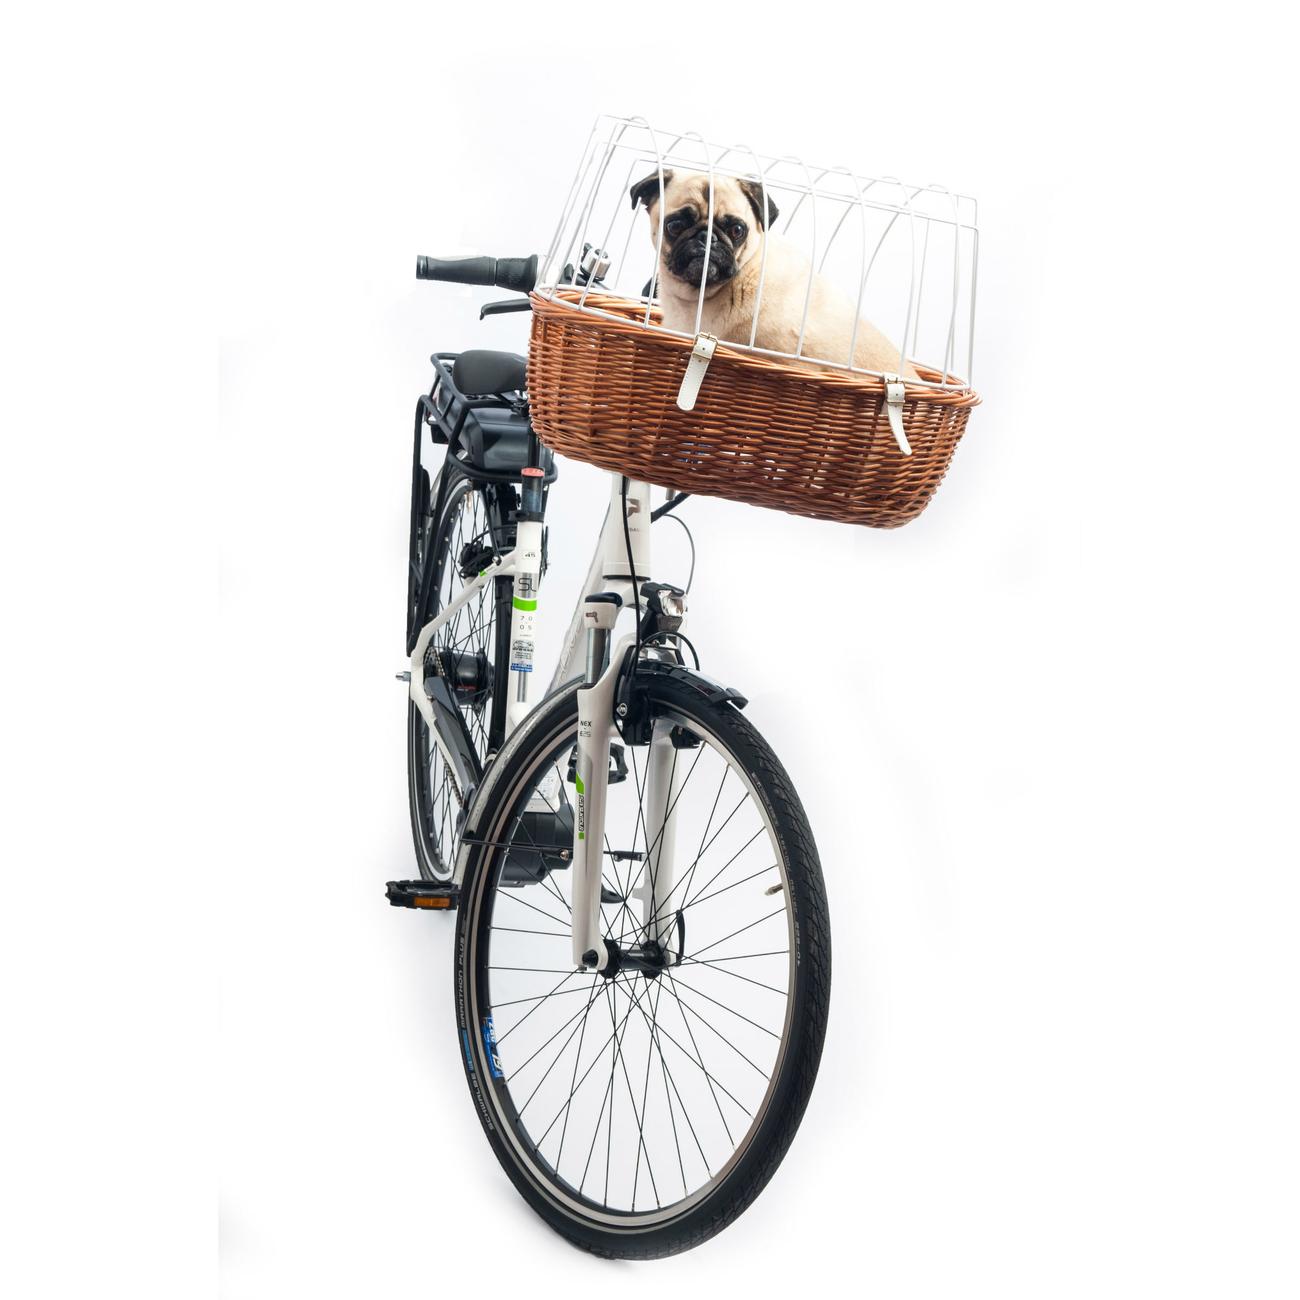 Aumüller E-Bike Hunde Fahrradkorb Standard vorne, Bild 8